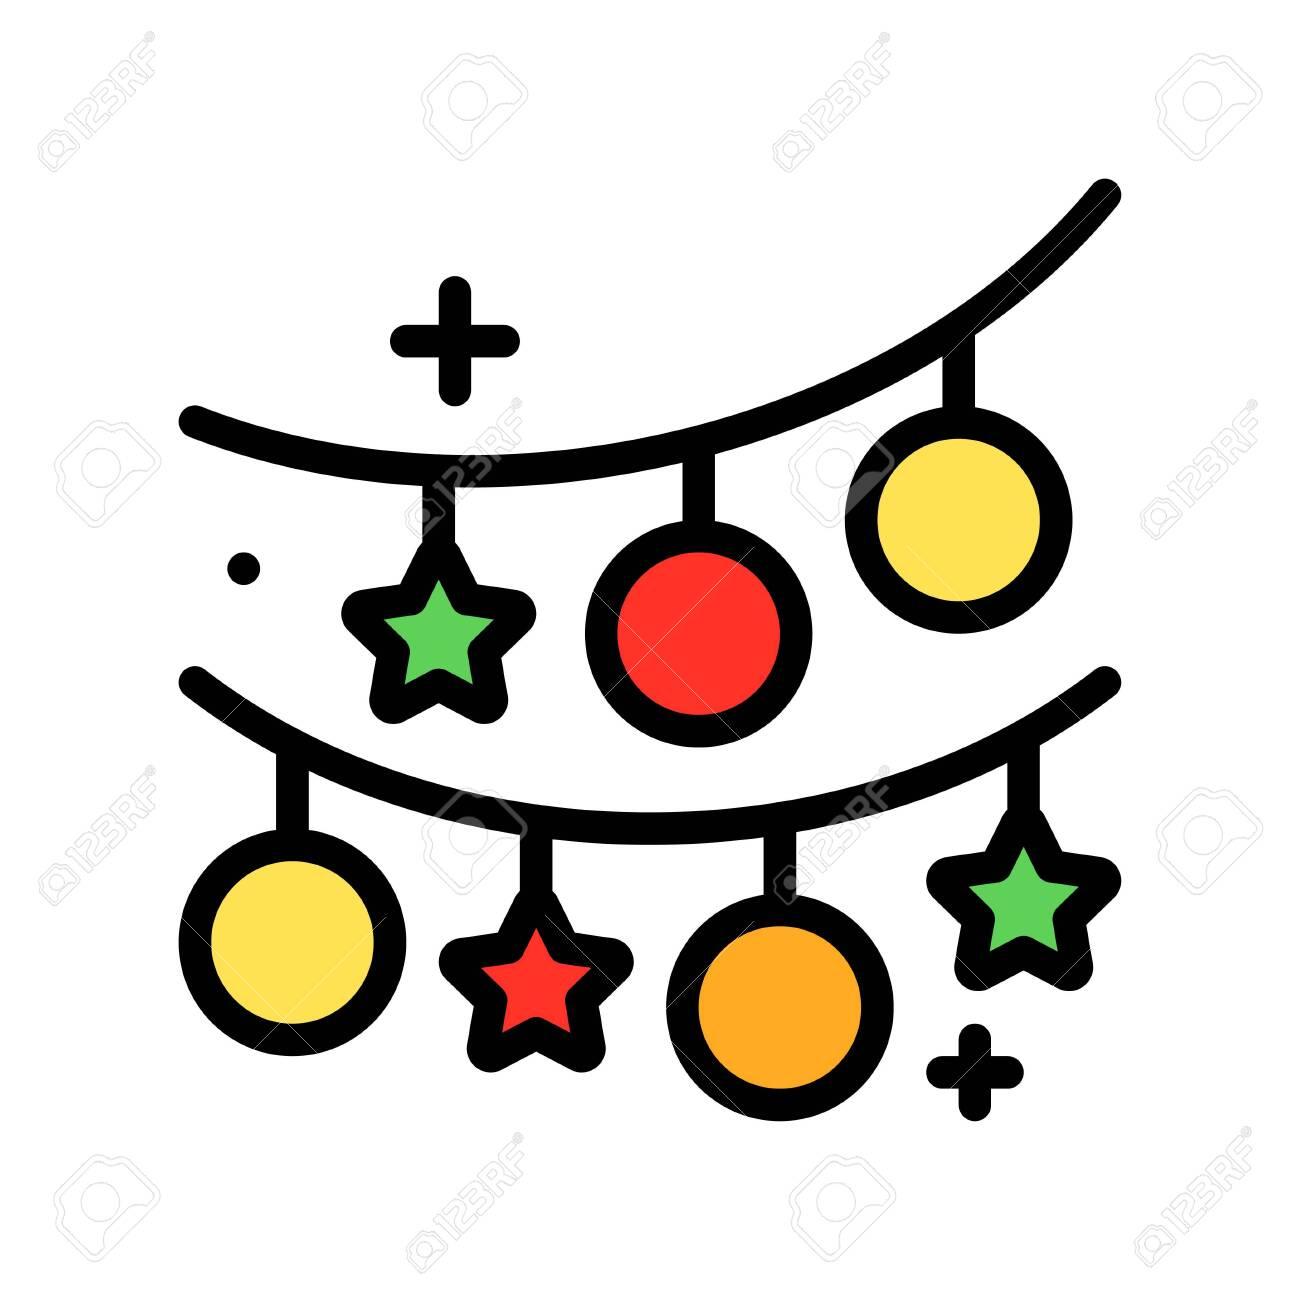 Christmas lights filled design icon, vector illustration - 136140002